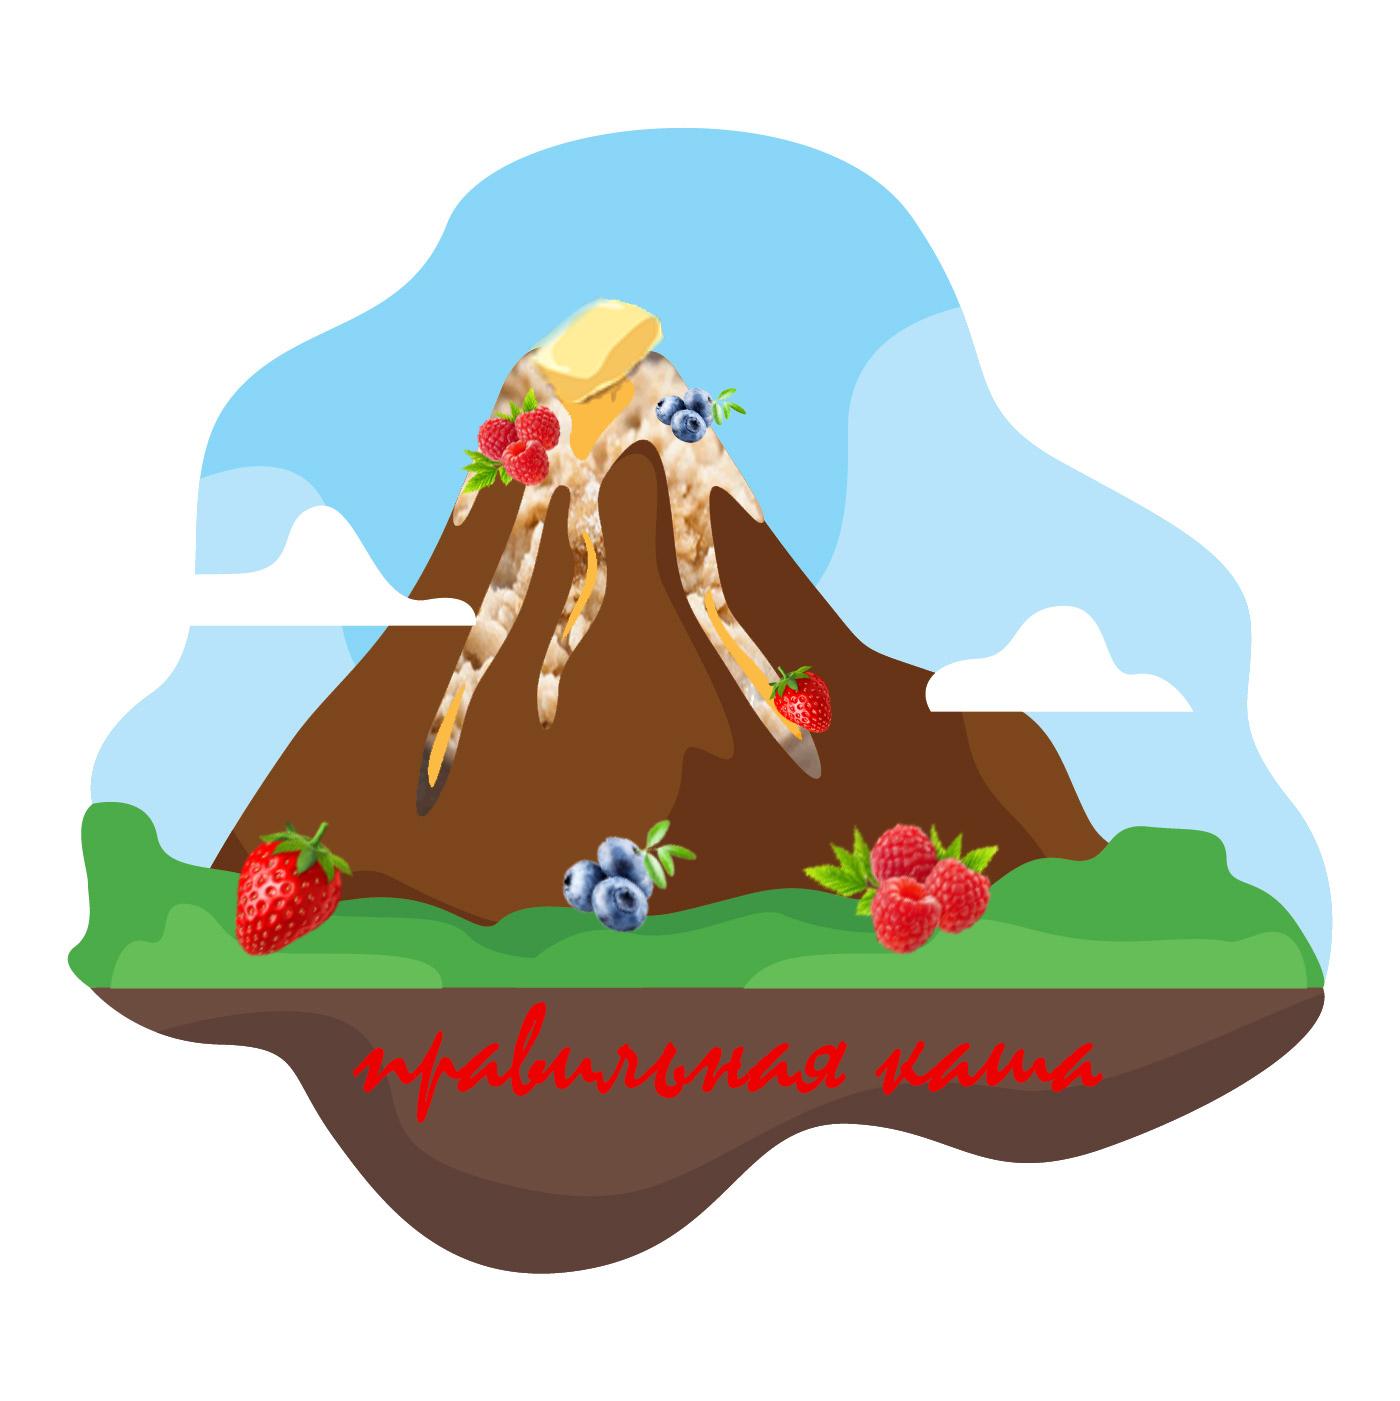 Веб-дизайнер, создание логотипа. фото f_4765ebcfc900940f.jpg